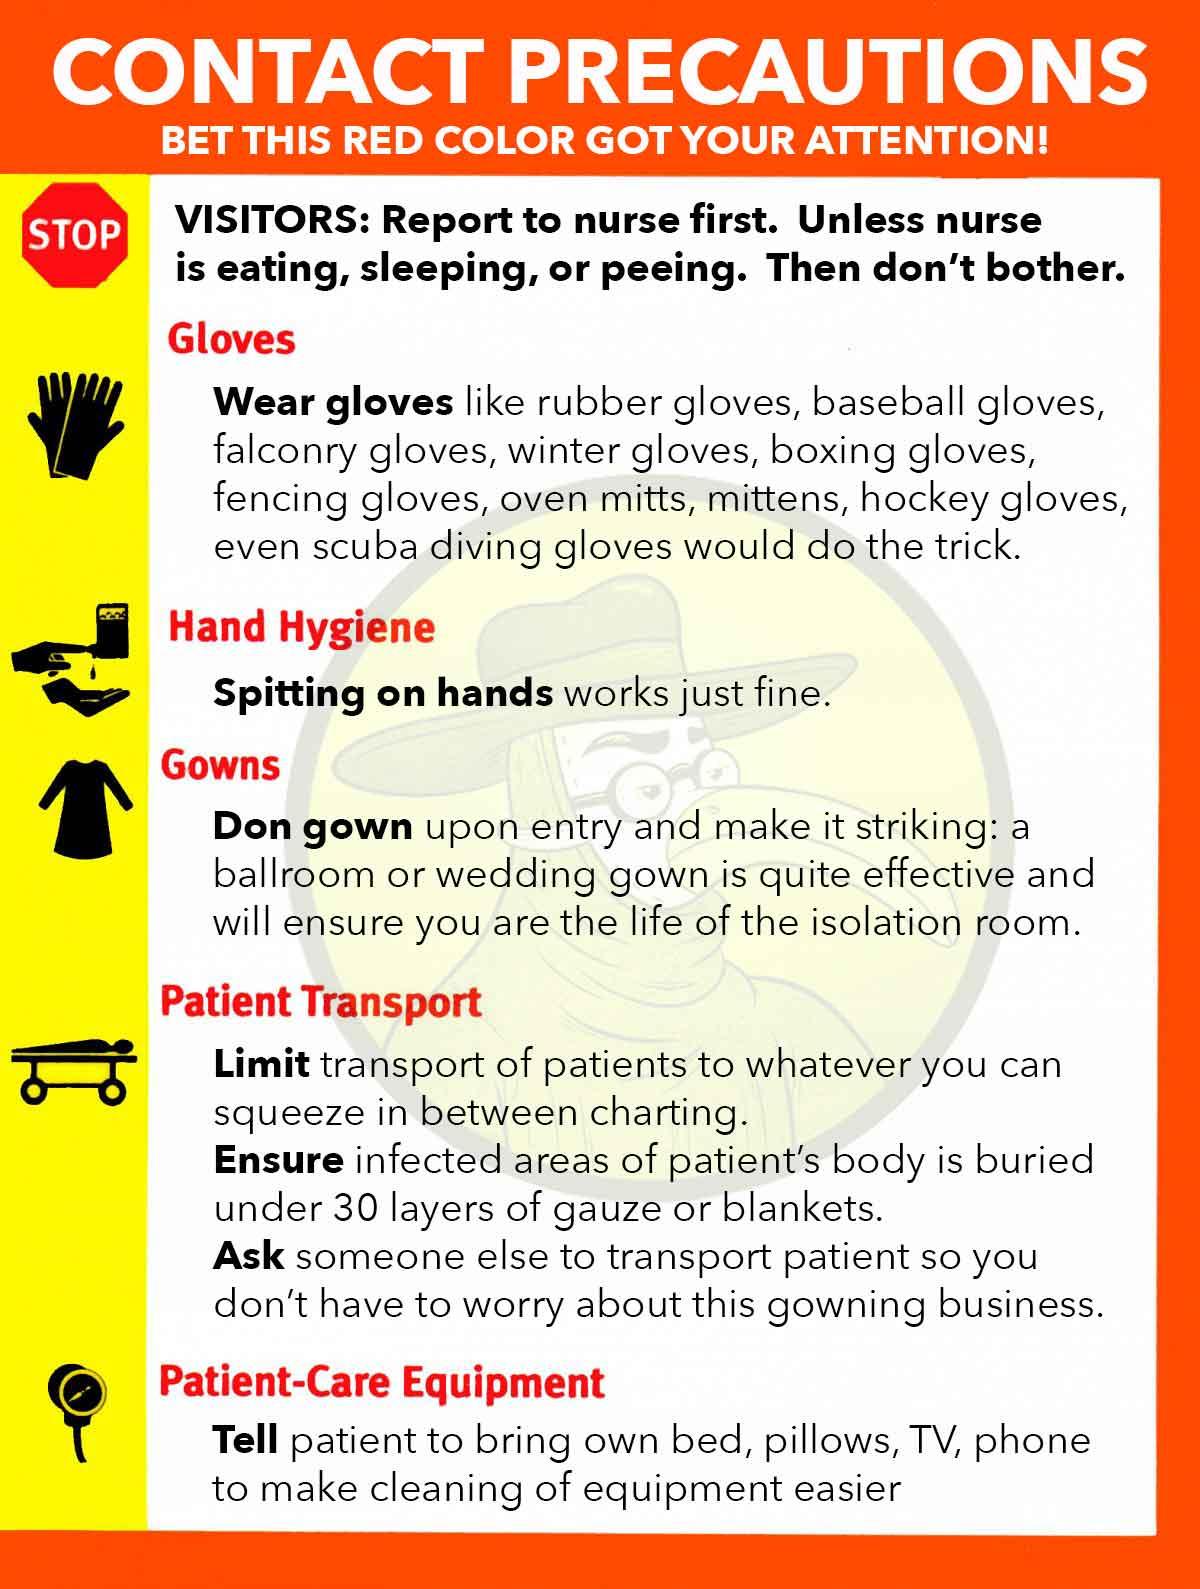 2016-revised-contact-precautions